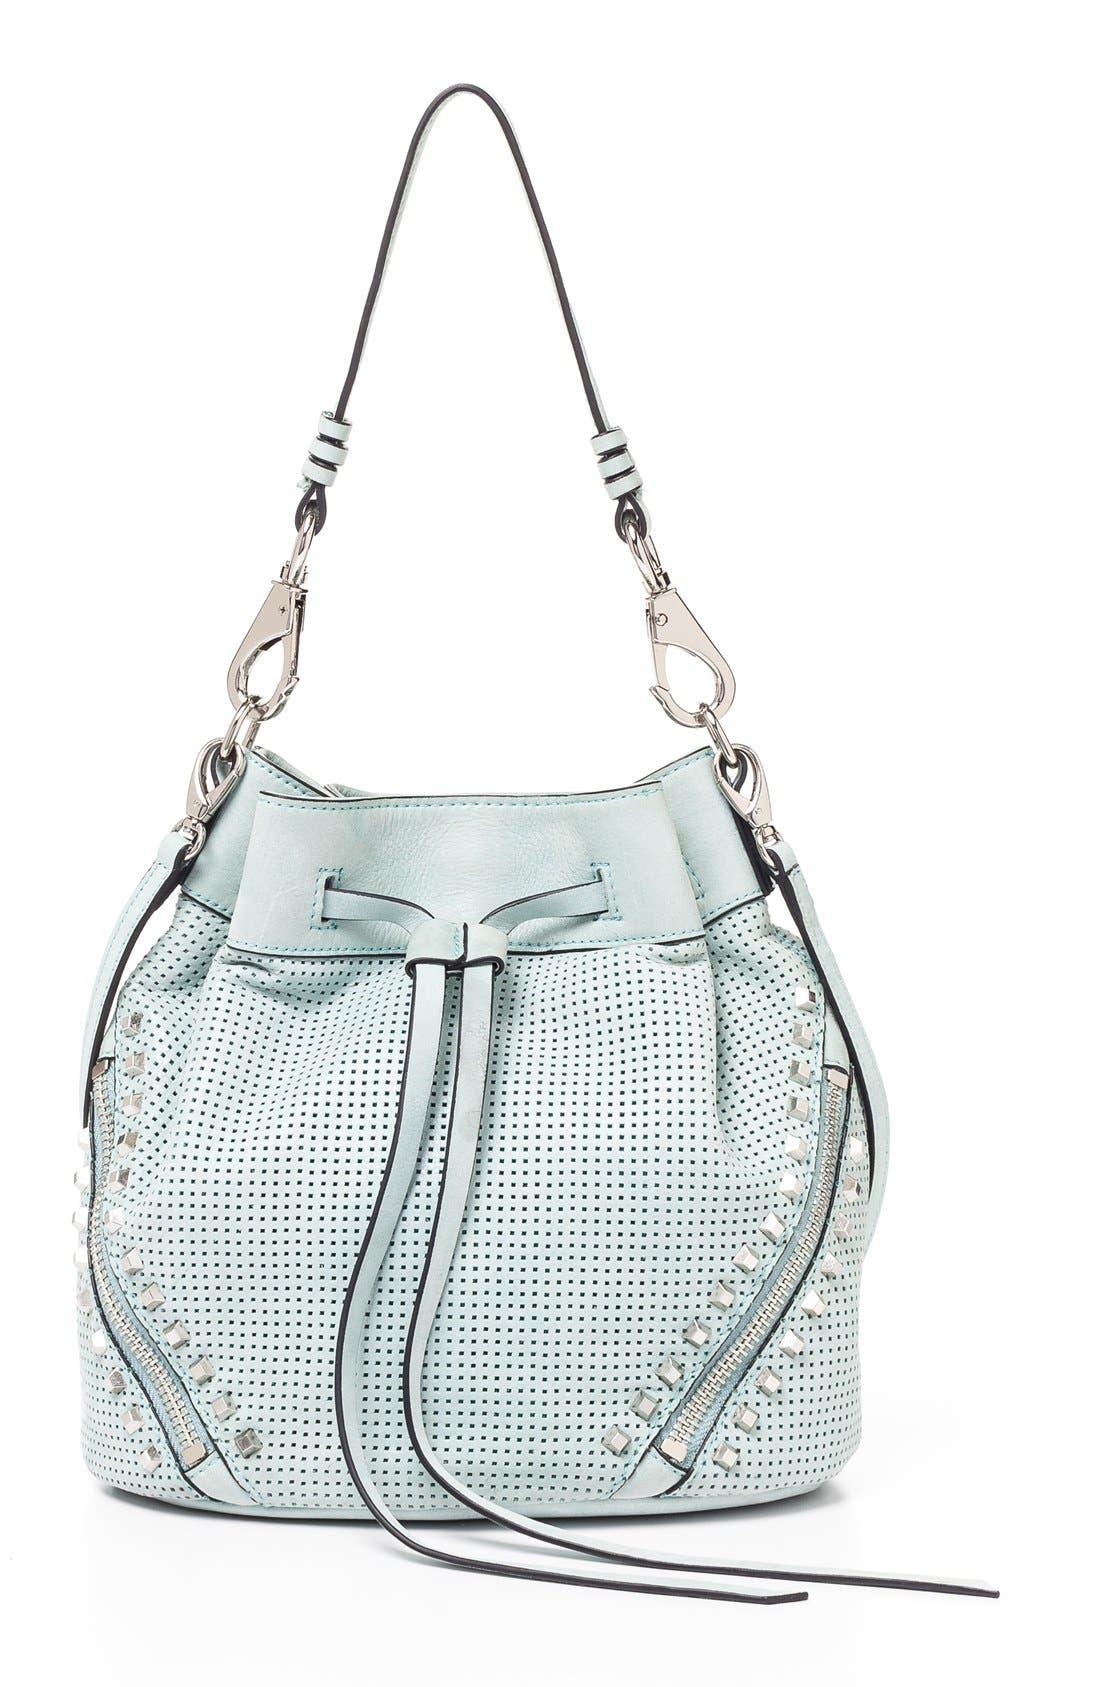 Main Image - She + Lo 'Make Your Mark' Leather Bucket Bag